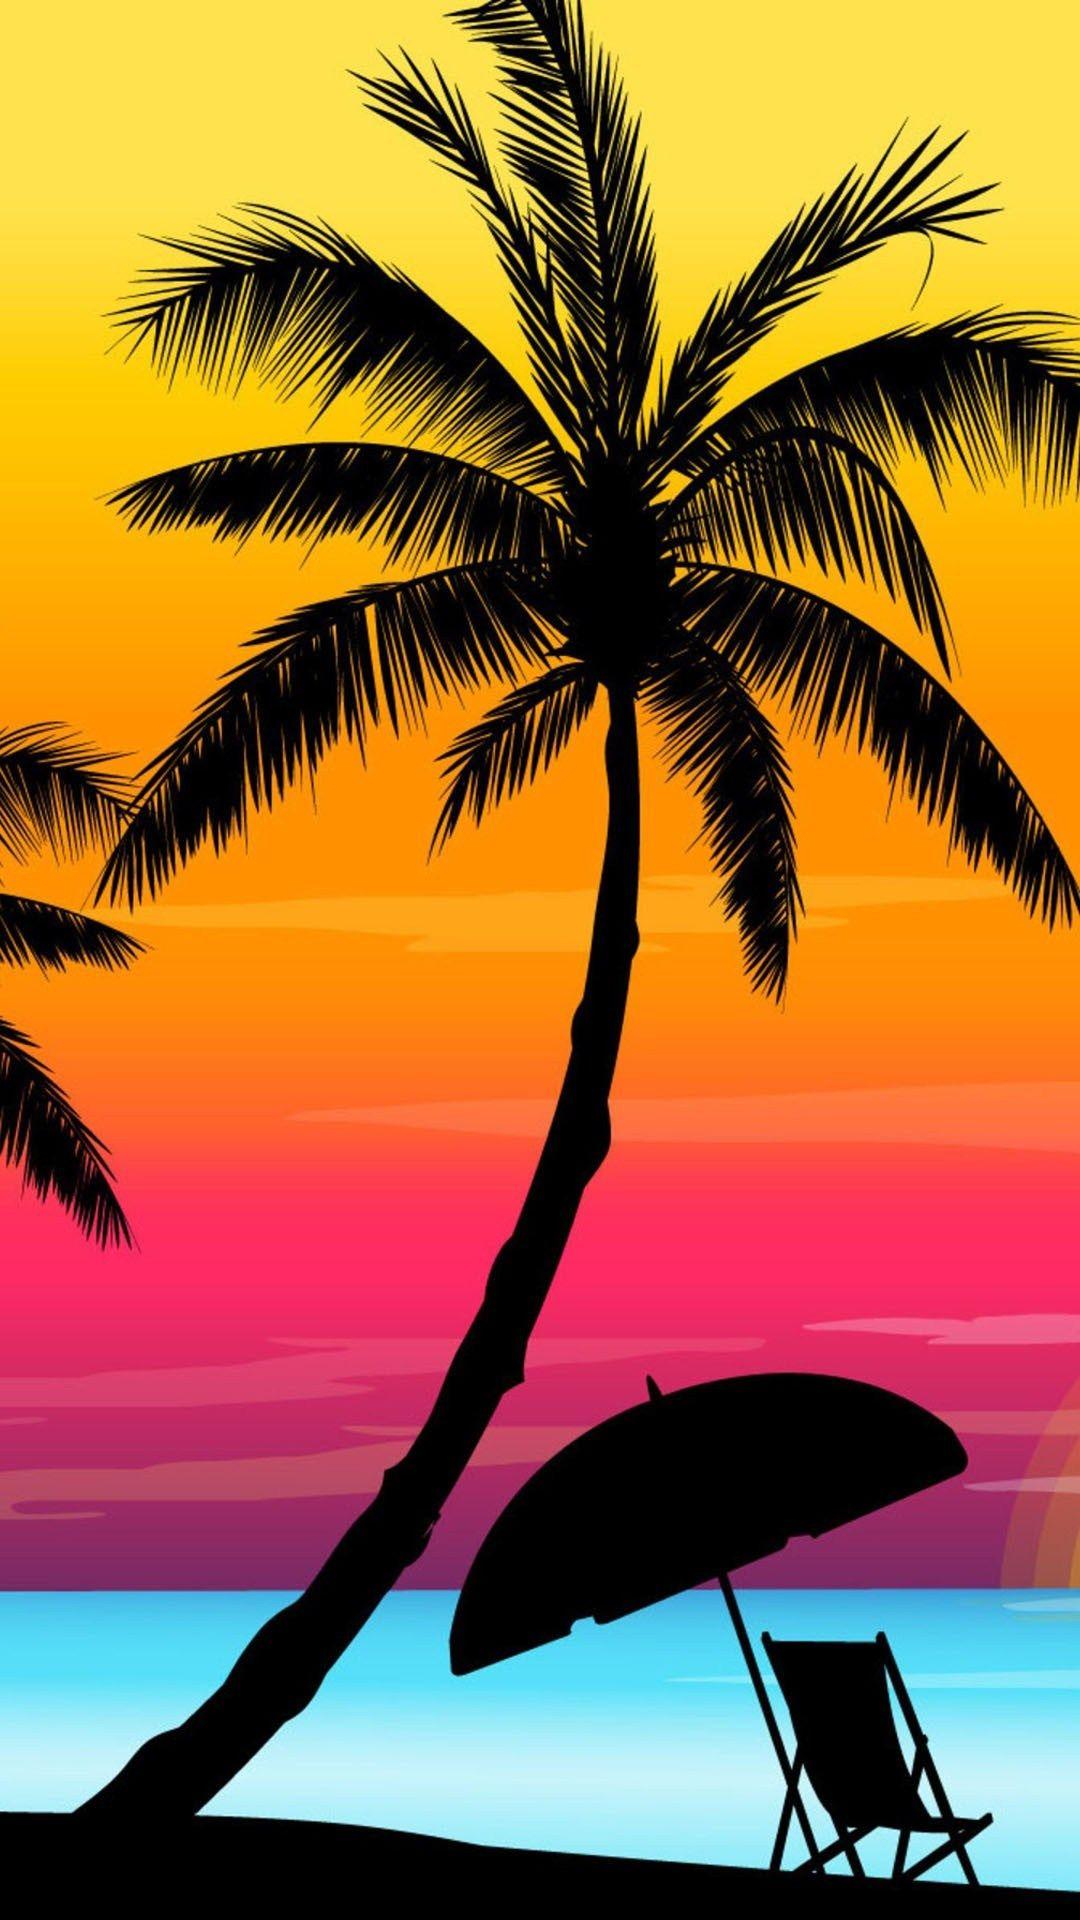 خلفيات Hd للاندرويد افضل خلفيات الهواتف الذكية 2018 Mobile Wallpapers Tecnologis Sunset Iphone Wallpaper Wallpaper Iphone Summer Summer Wallpaper